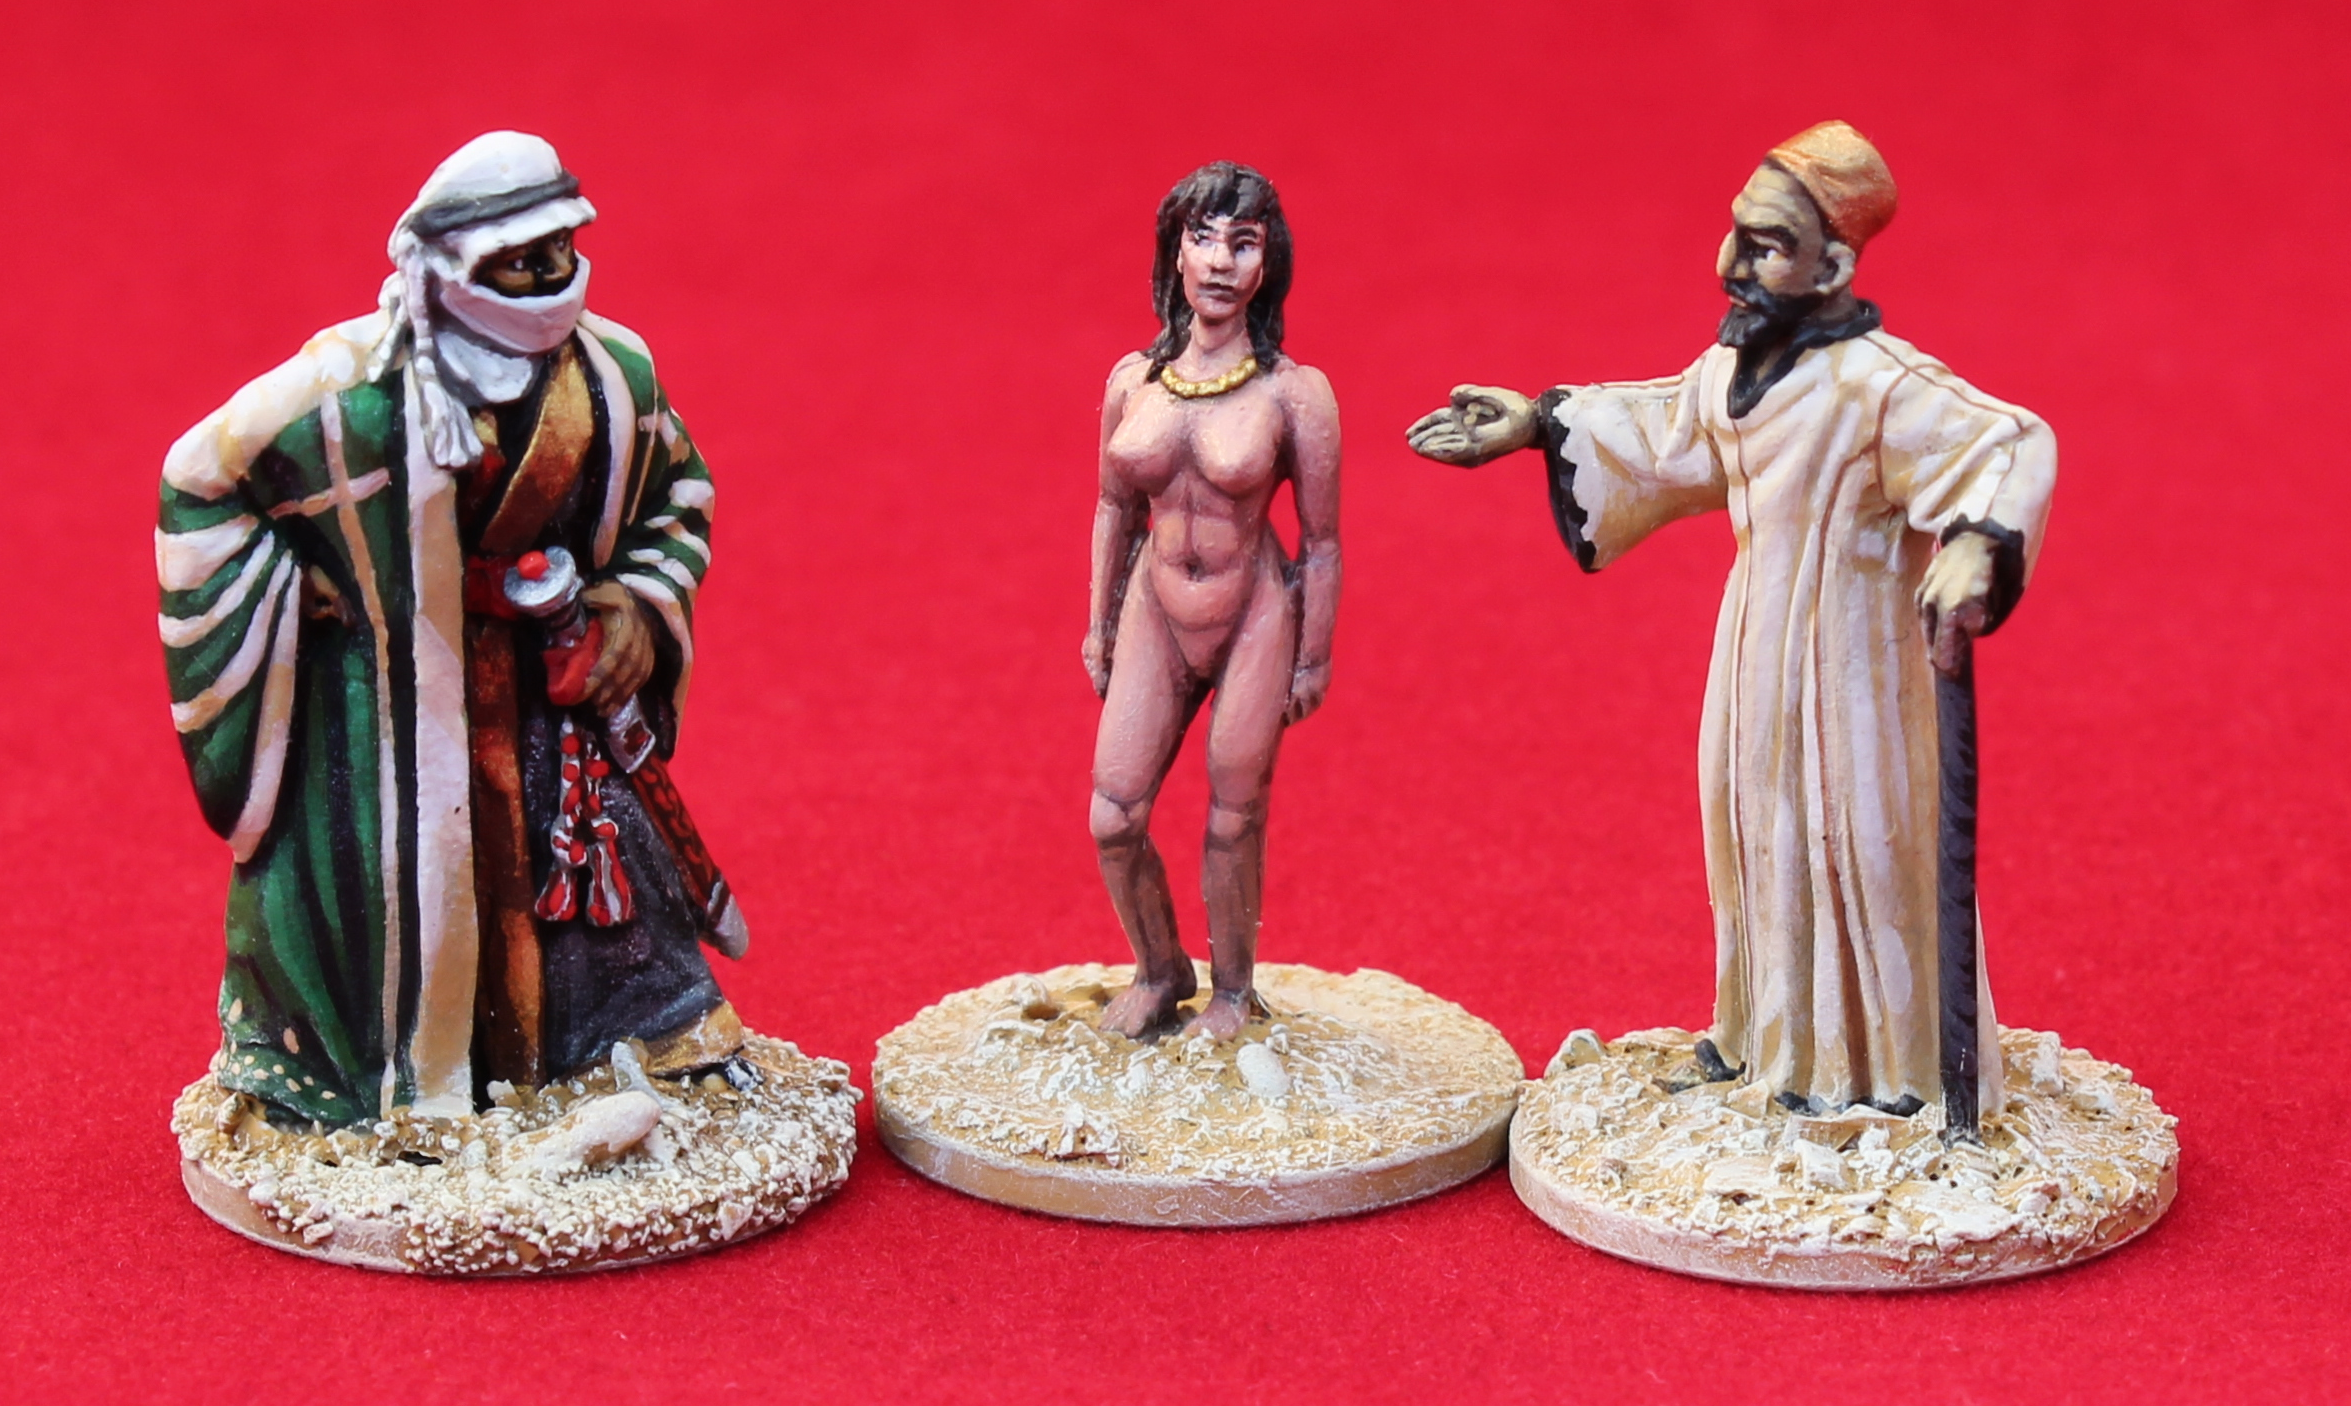 Slave figures